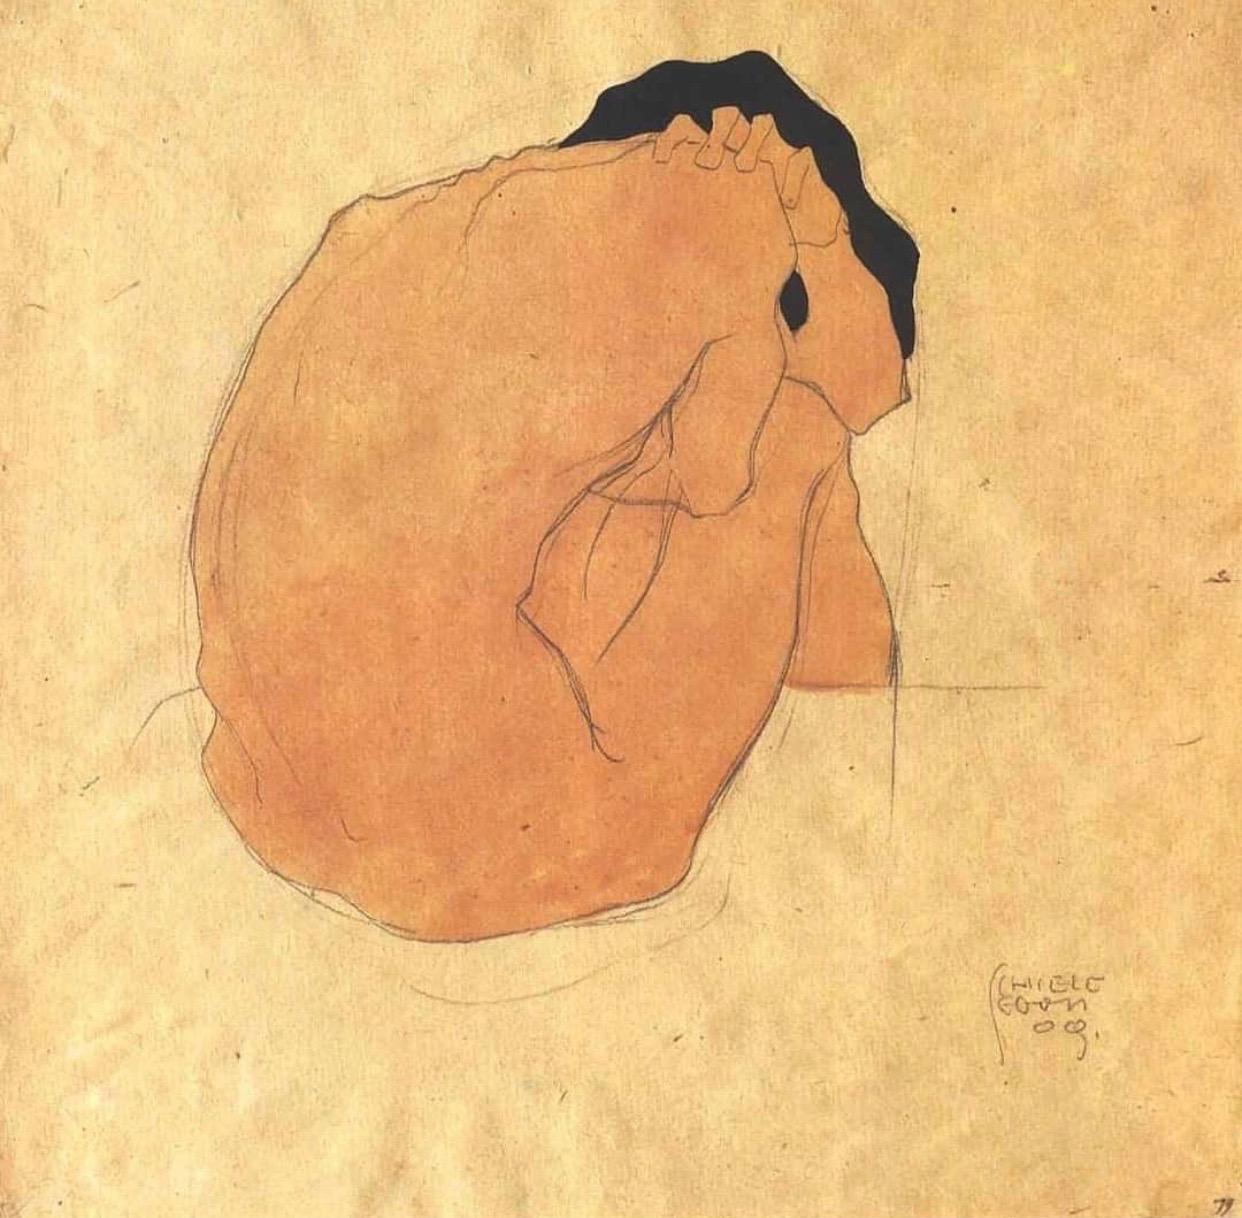 Illustration by Egon Schiele